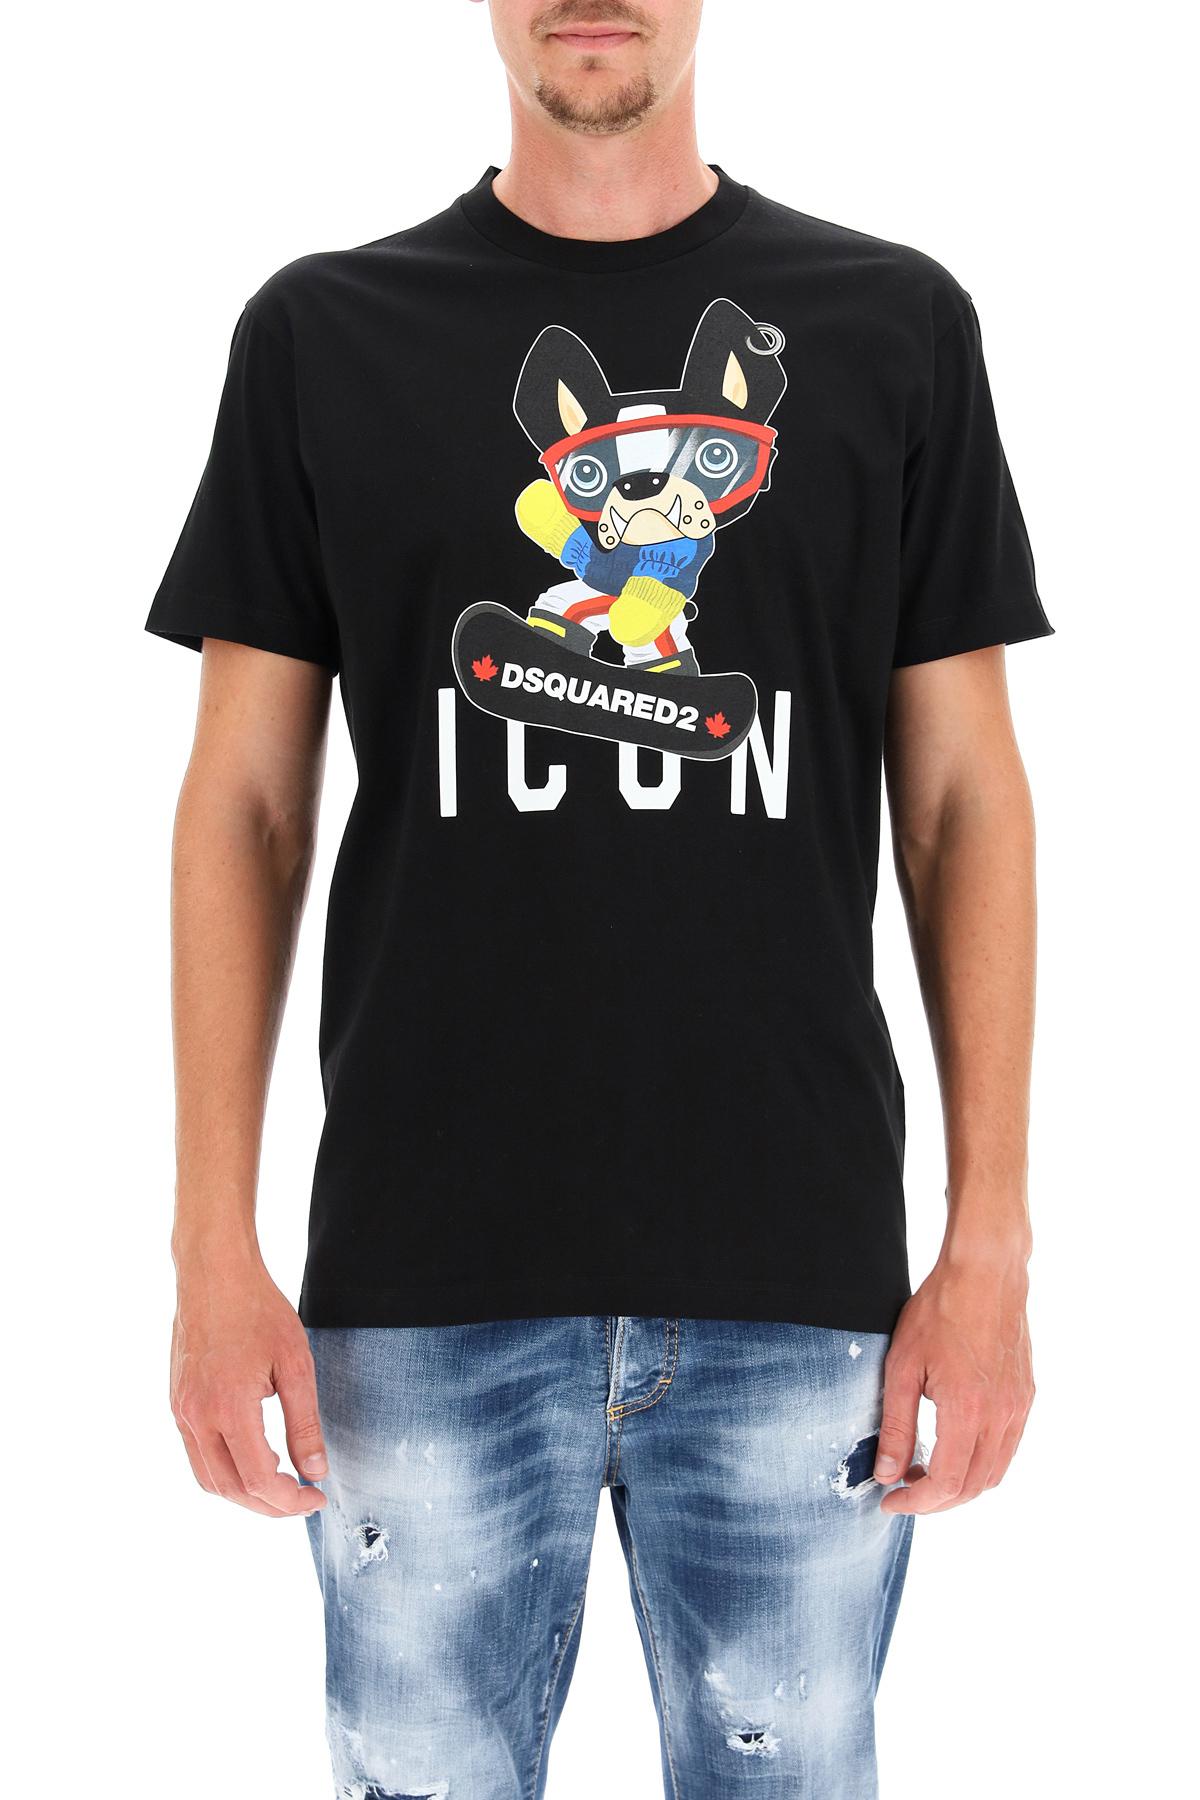 Dsquared2 t-shirt stampa icon ciro